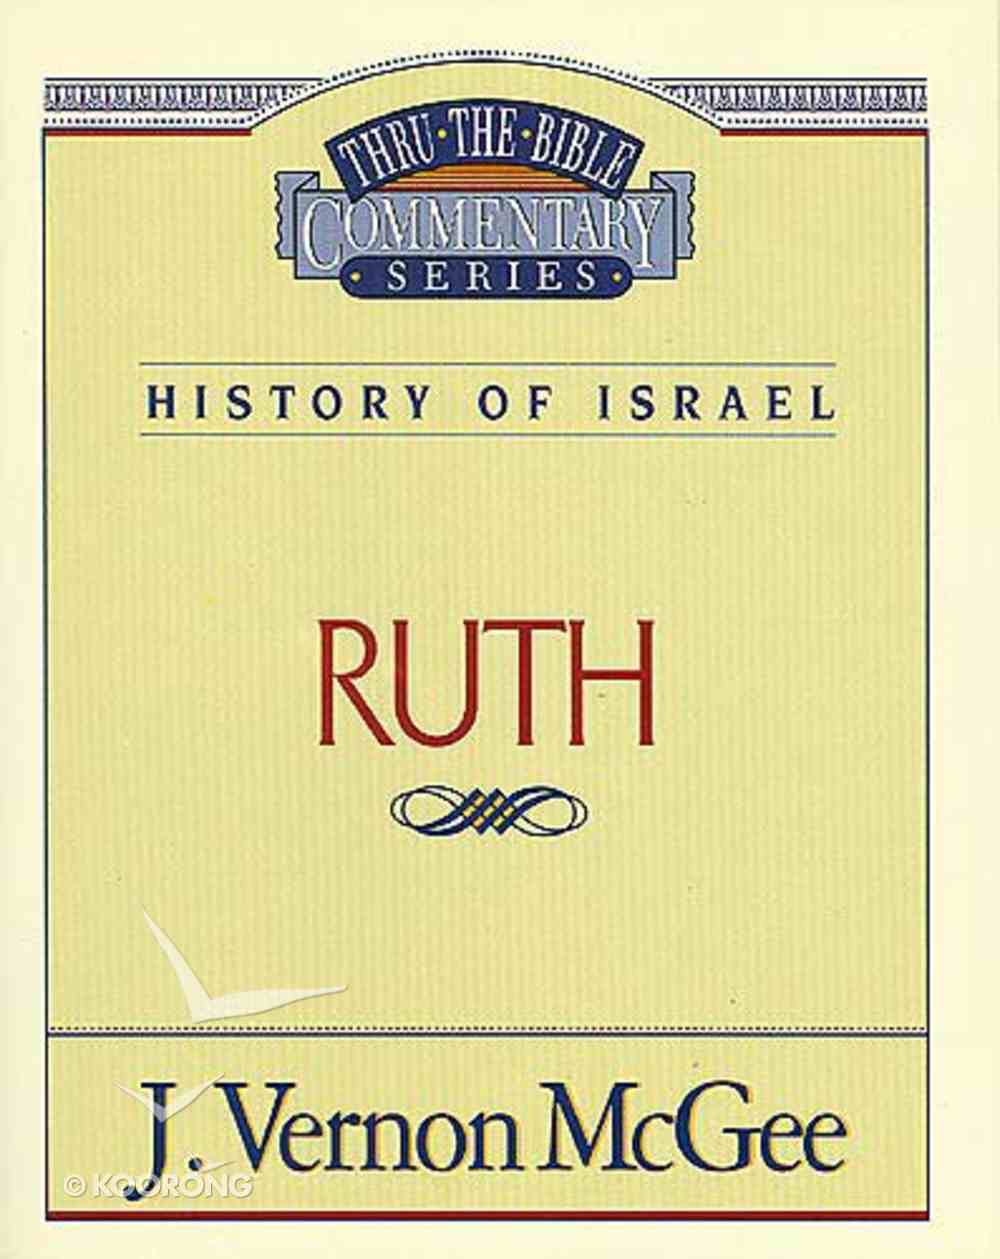 Thru the Bible OT #11: Ruth (#11 in Thru The Bible Old Testament Series) Paperback